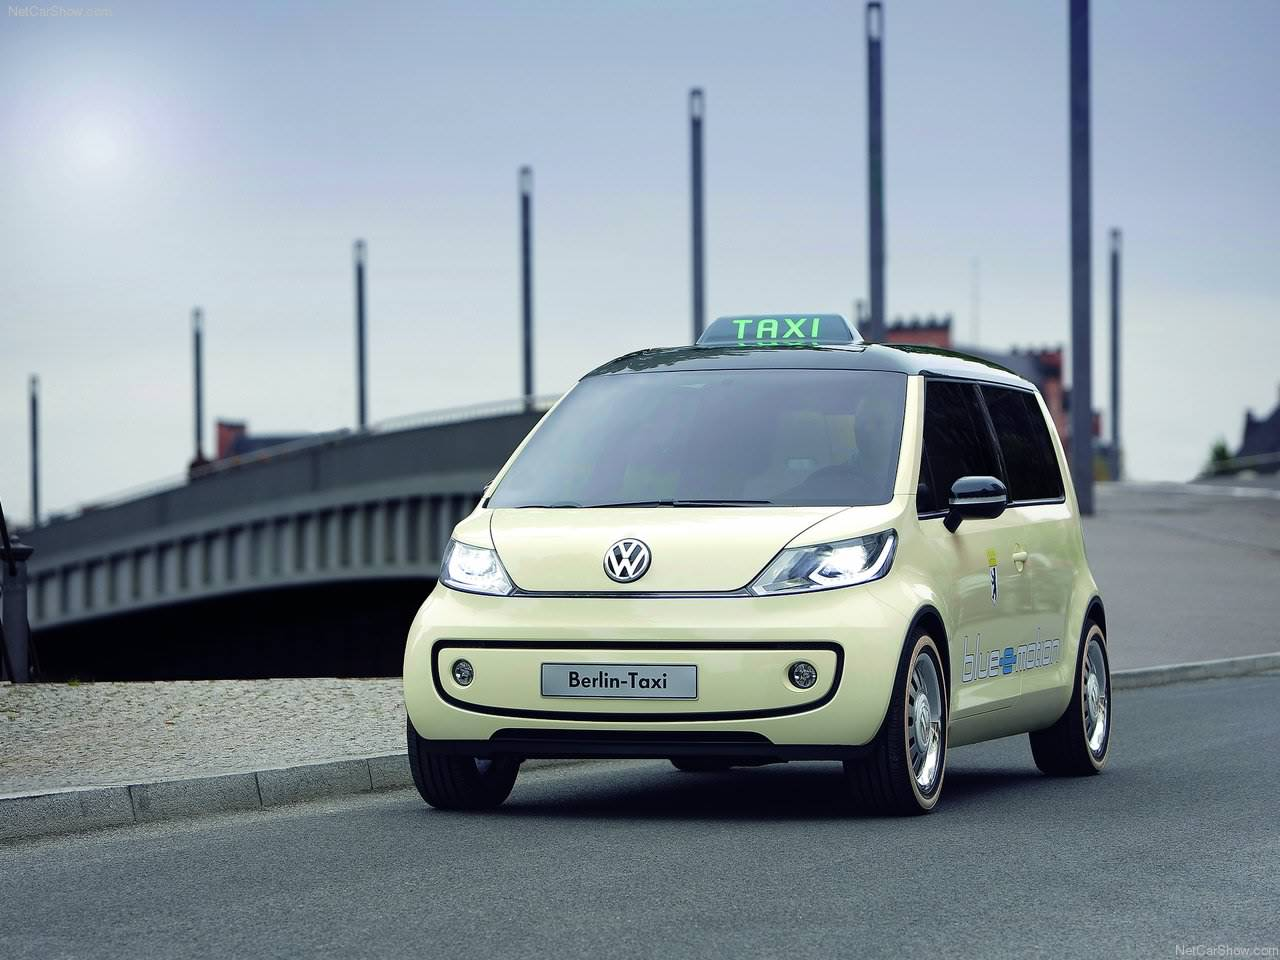 2010 volkswagen berlin taxi concept. Black Bedroom Furniture Sets. Home Design Ideas